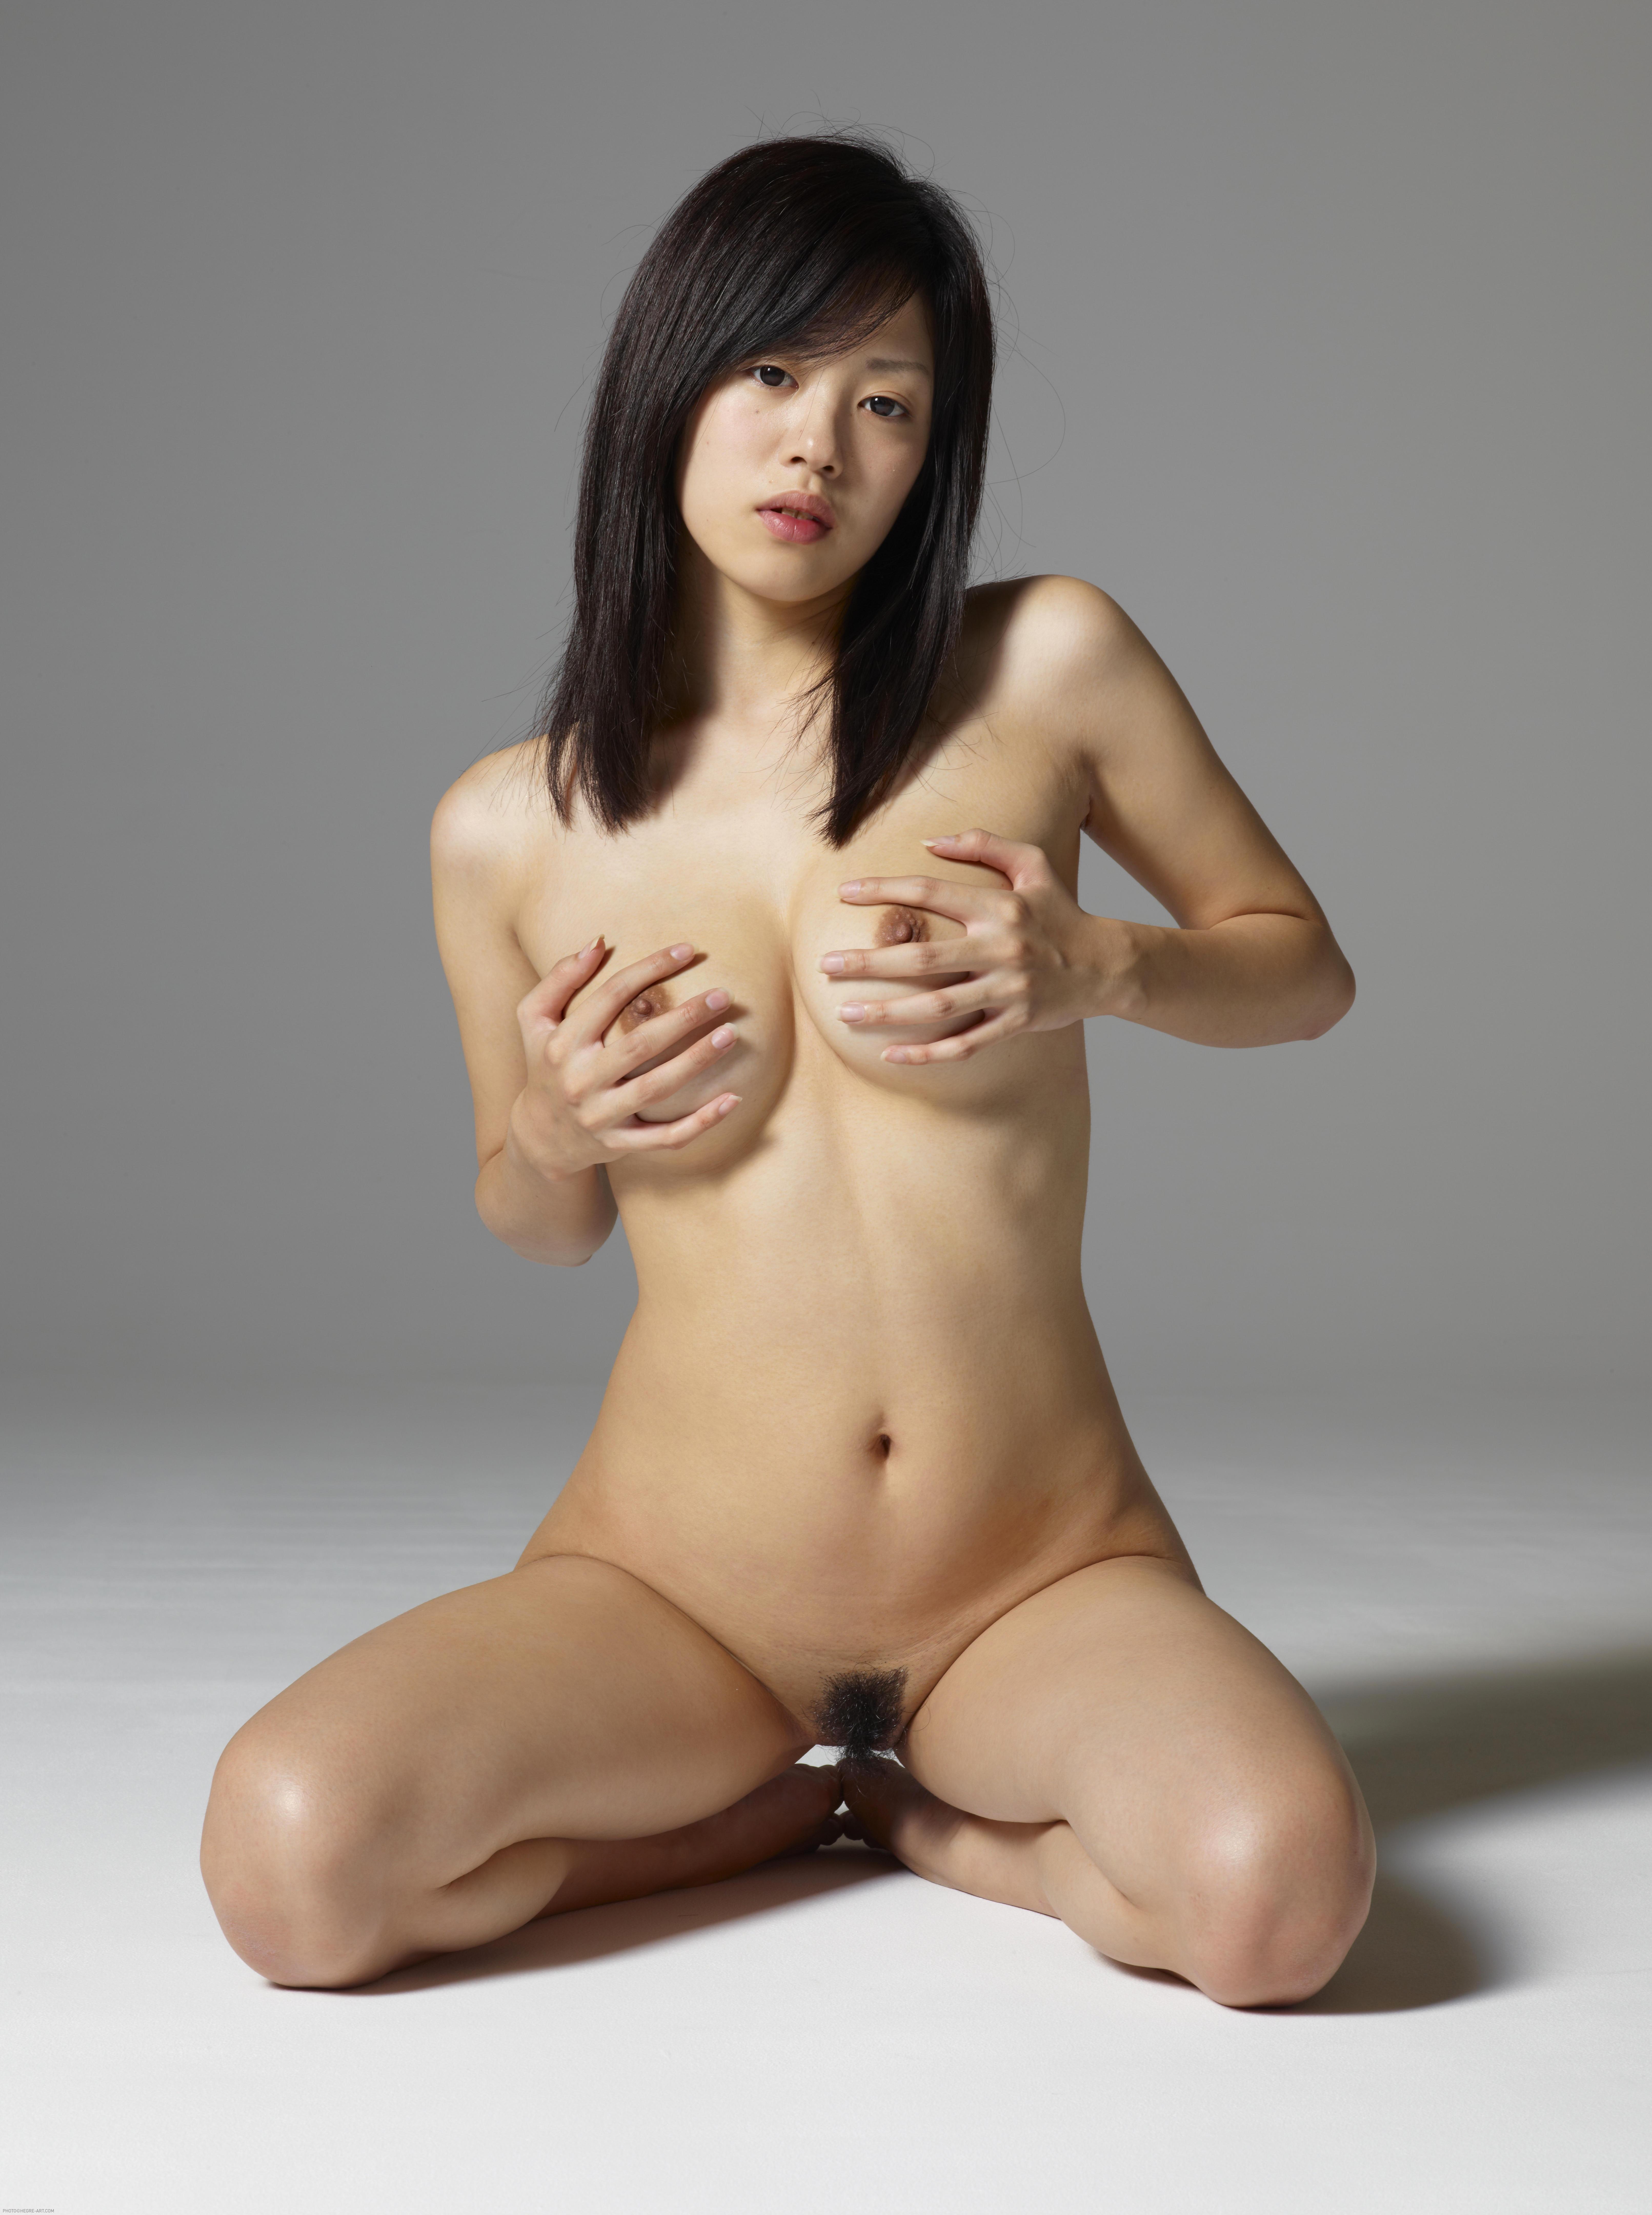 Jordyn chang nude pics, page